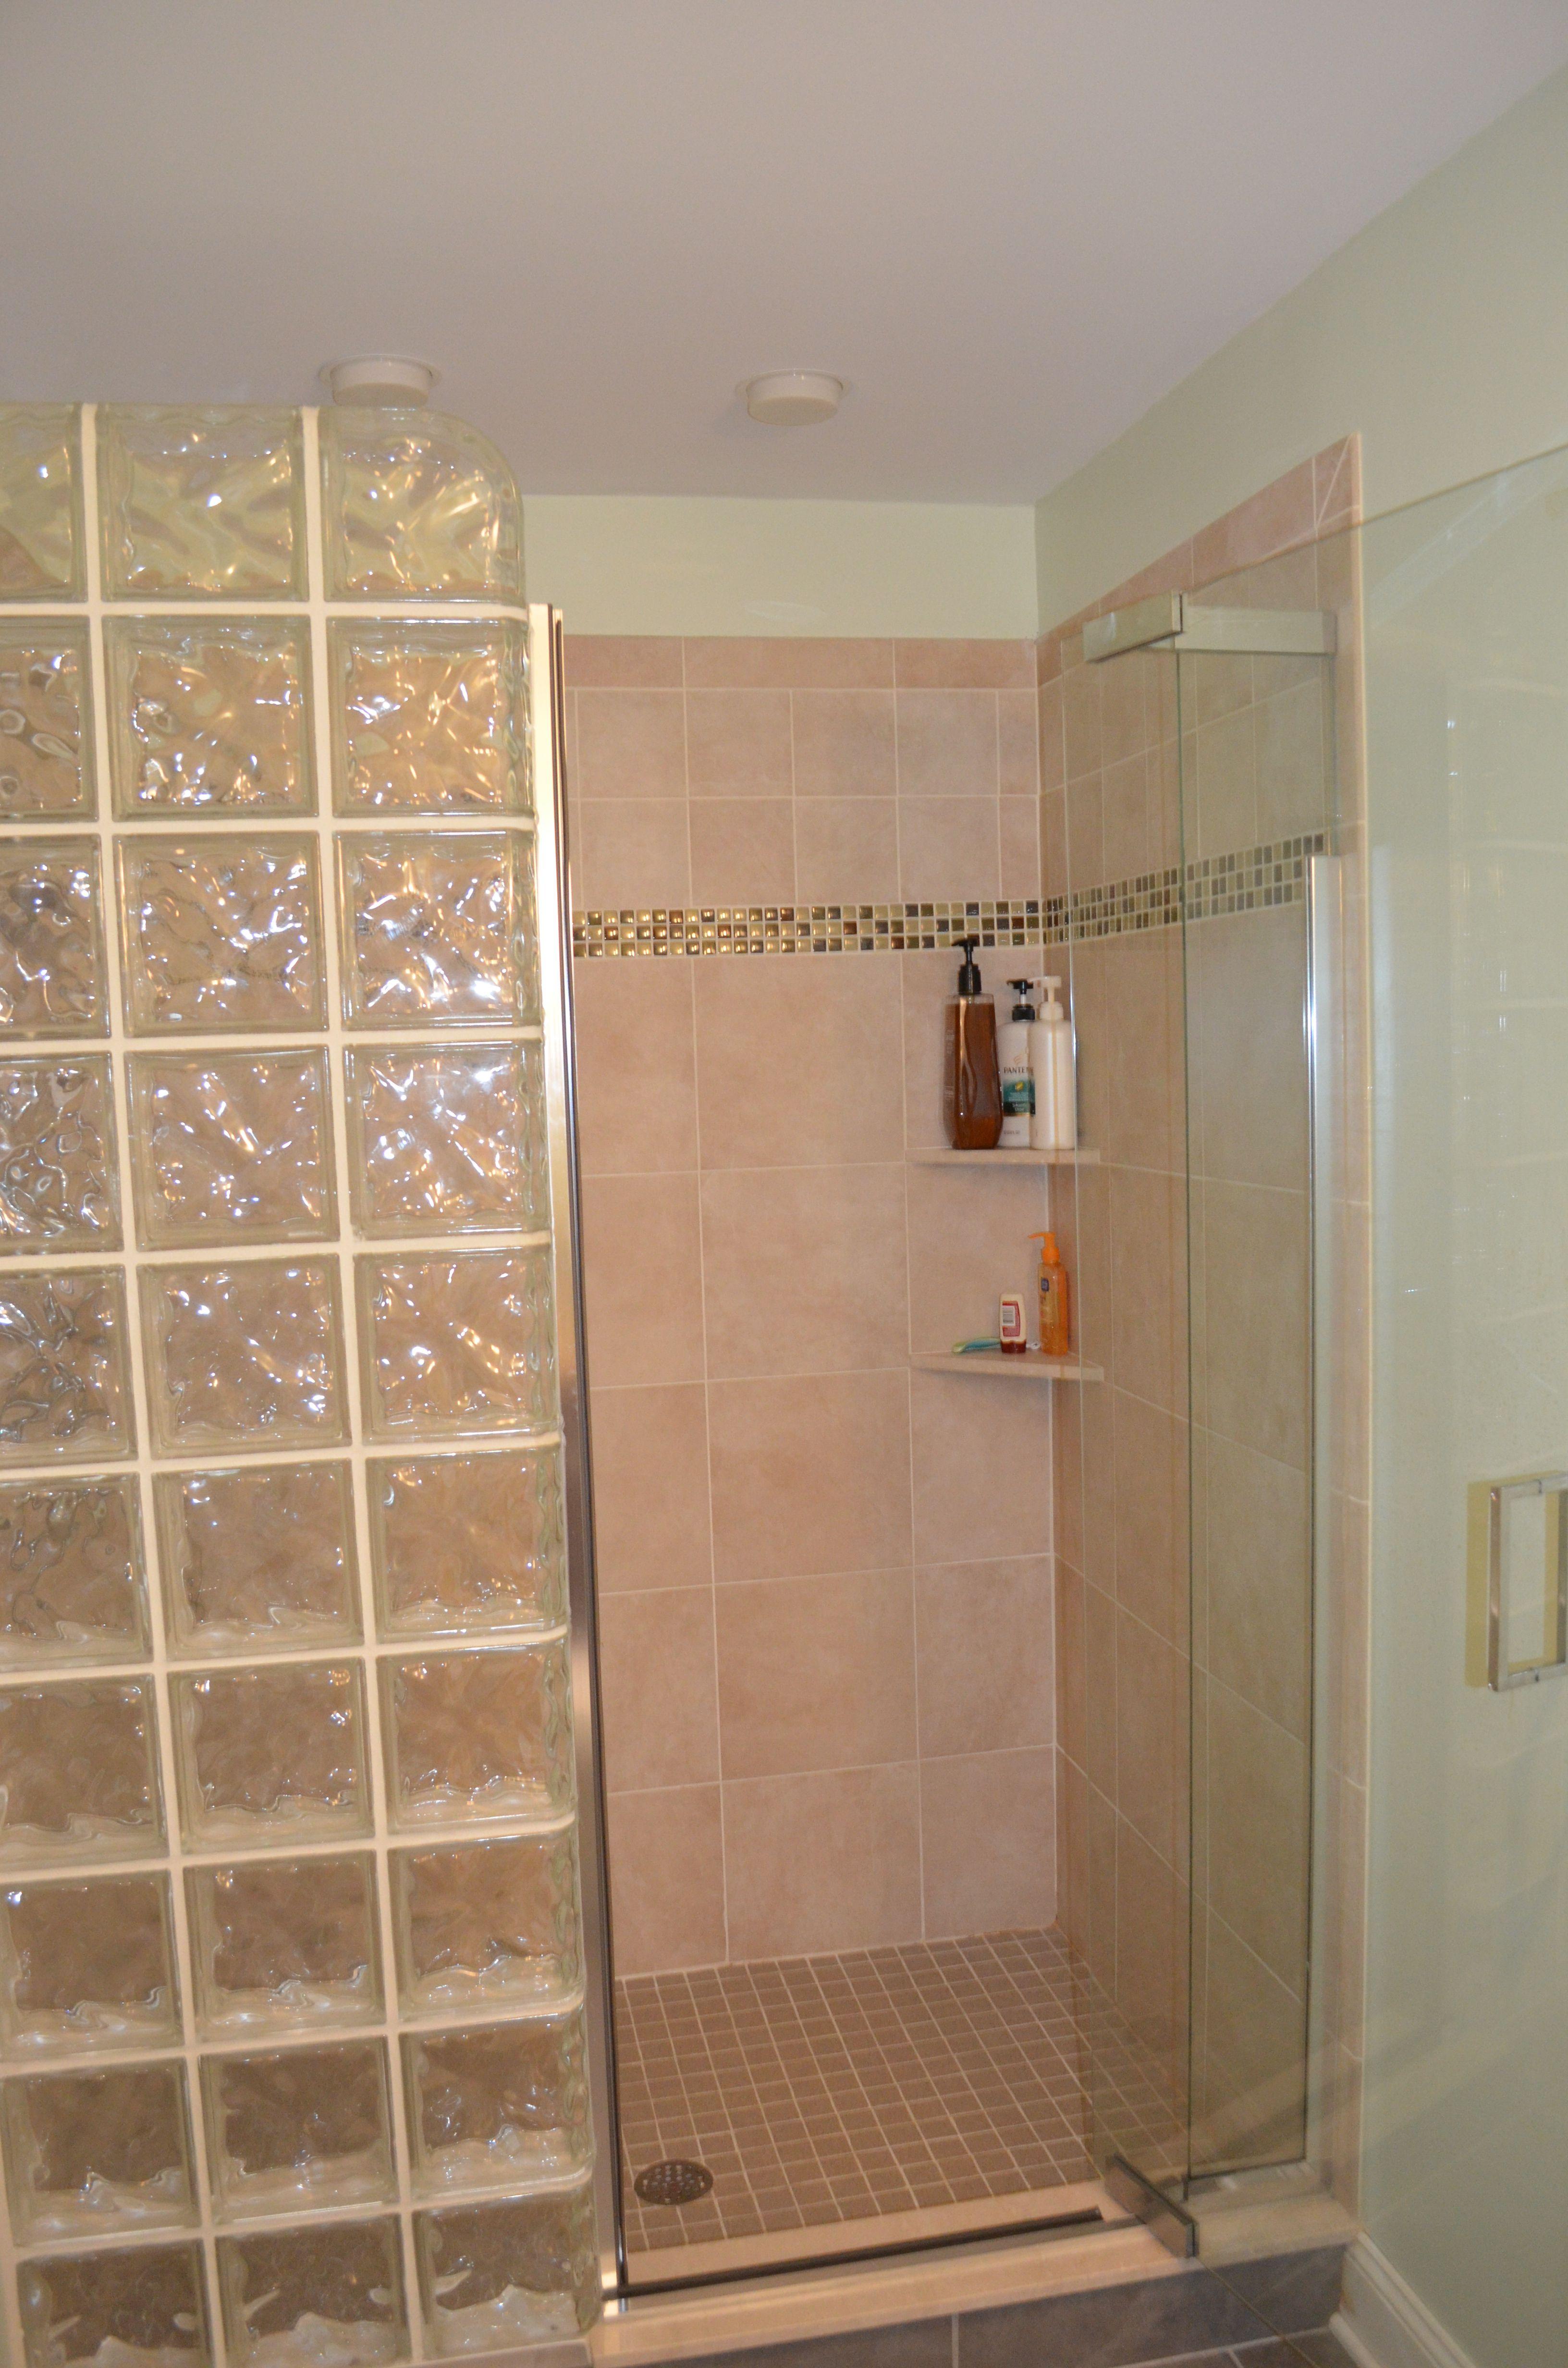 Glass Block Shower Wall Modelos De Baños Pequeños Modelos De Baños Baños Pequeños